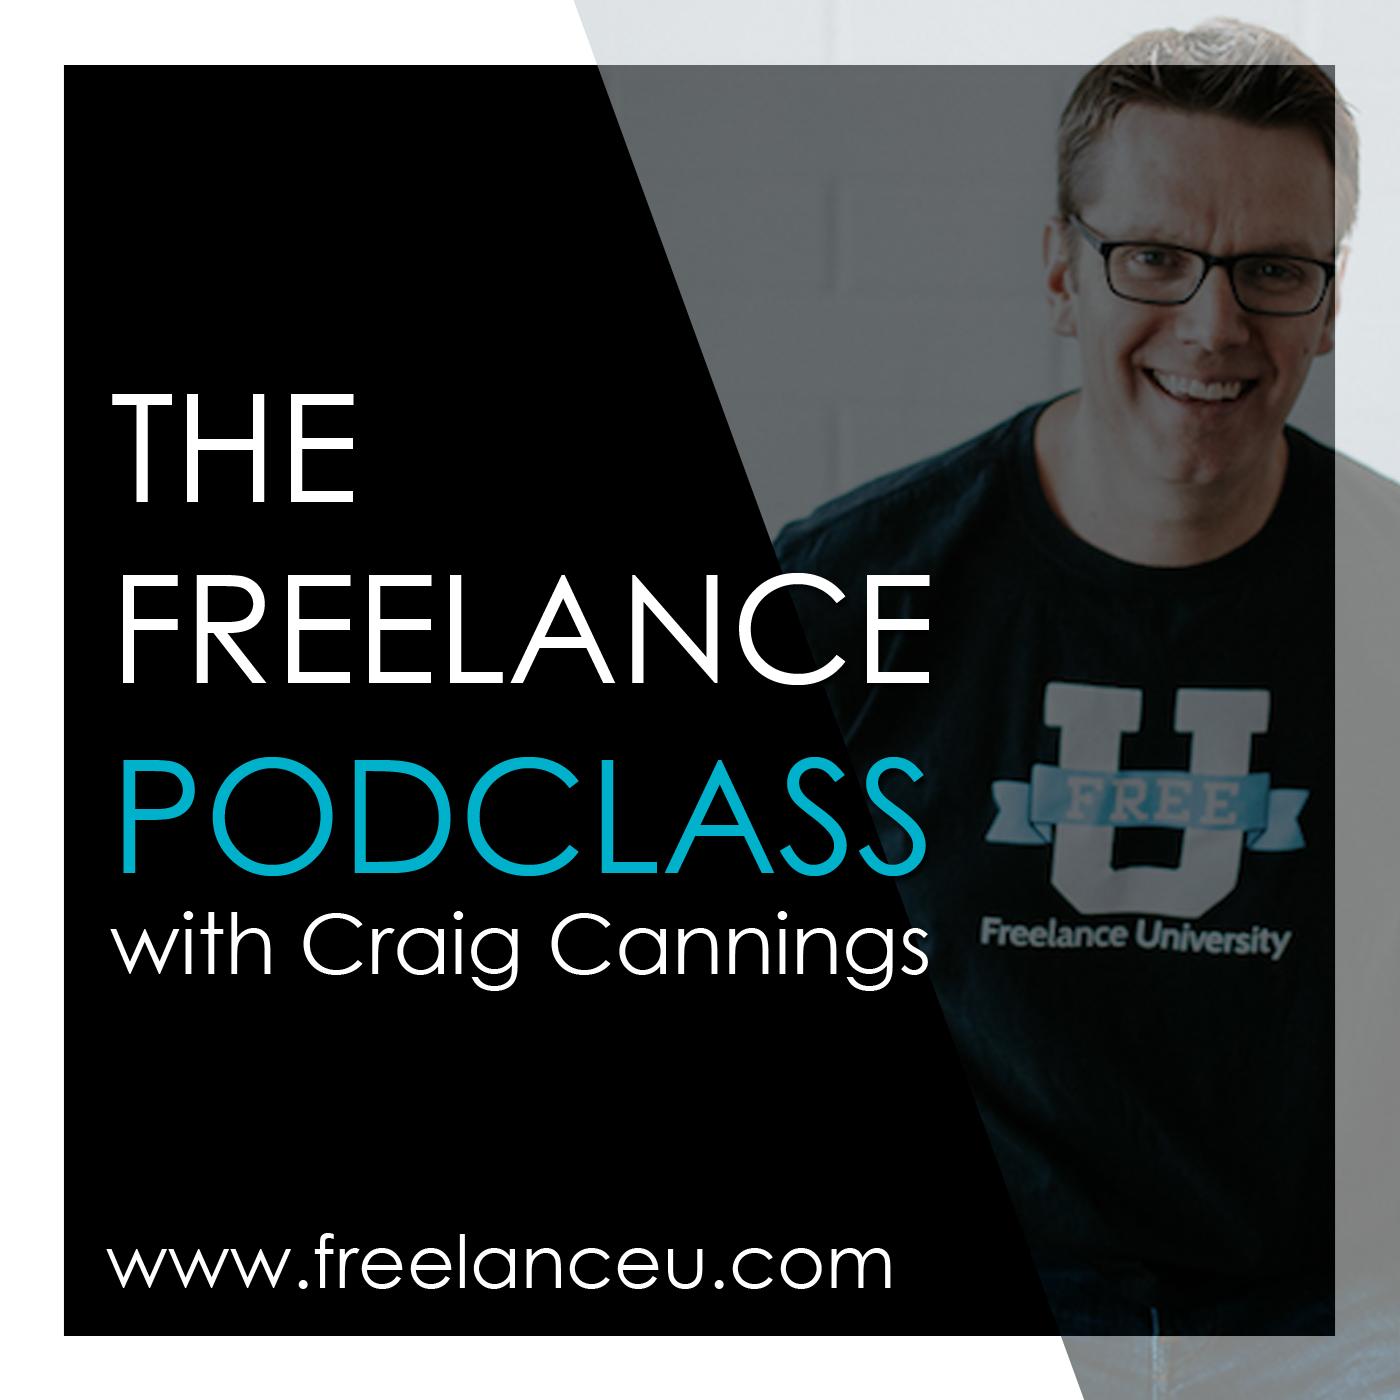 The Freelance Podclass